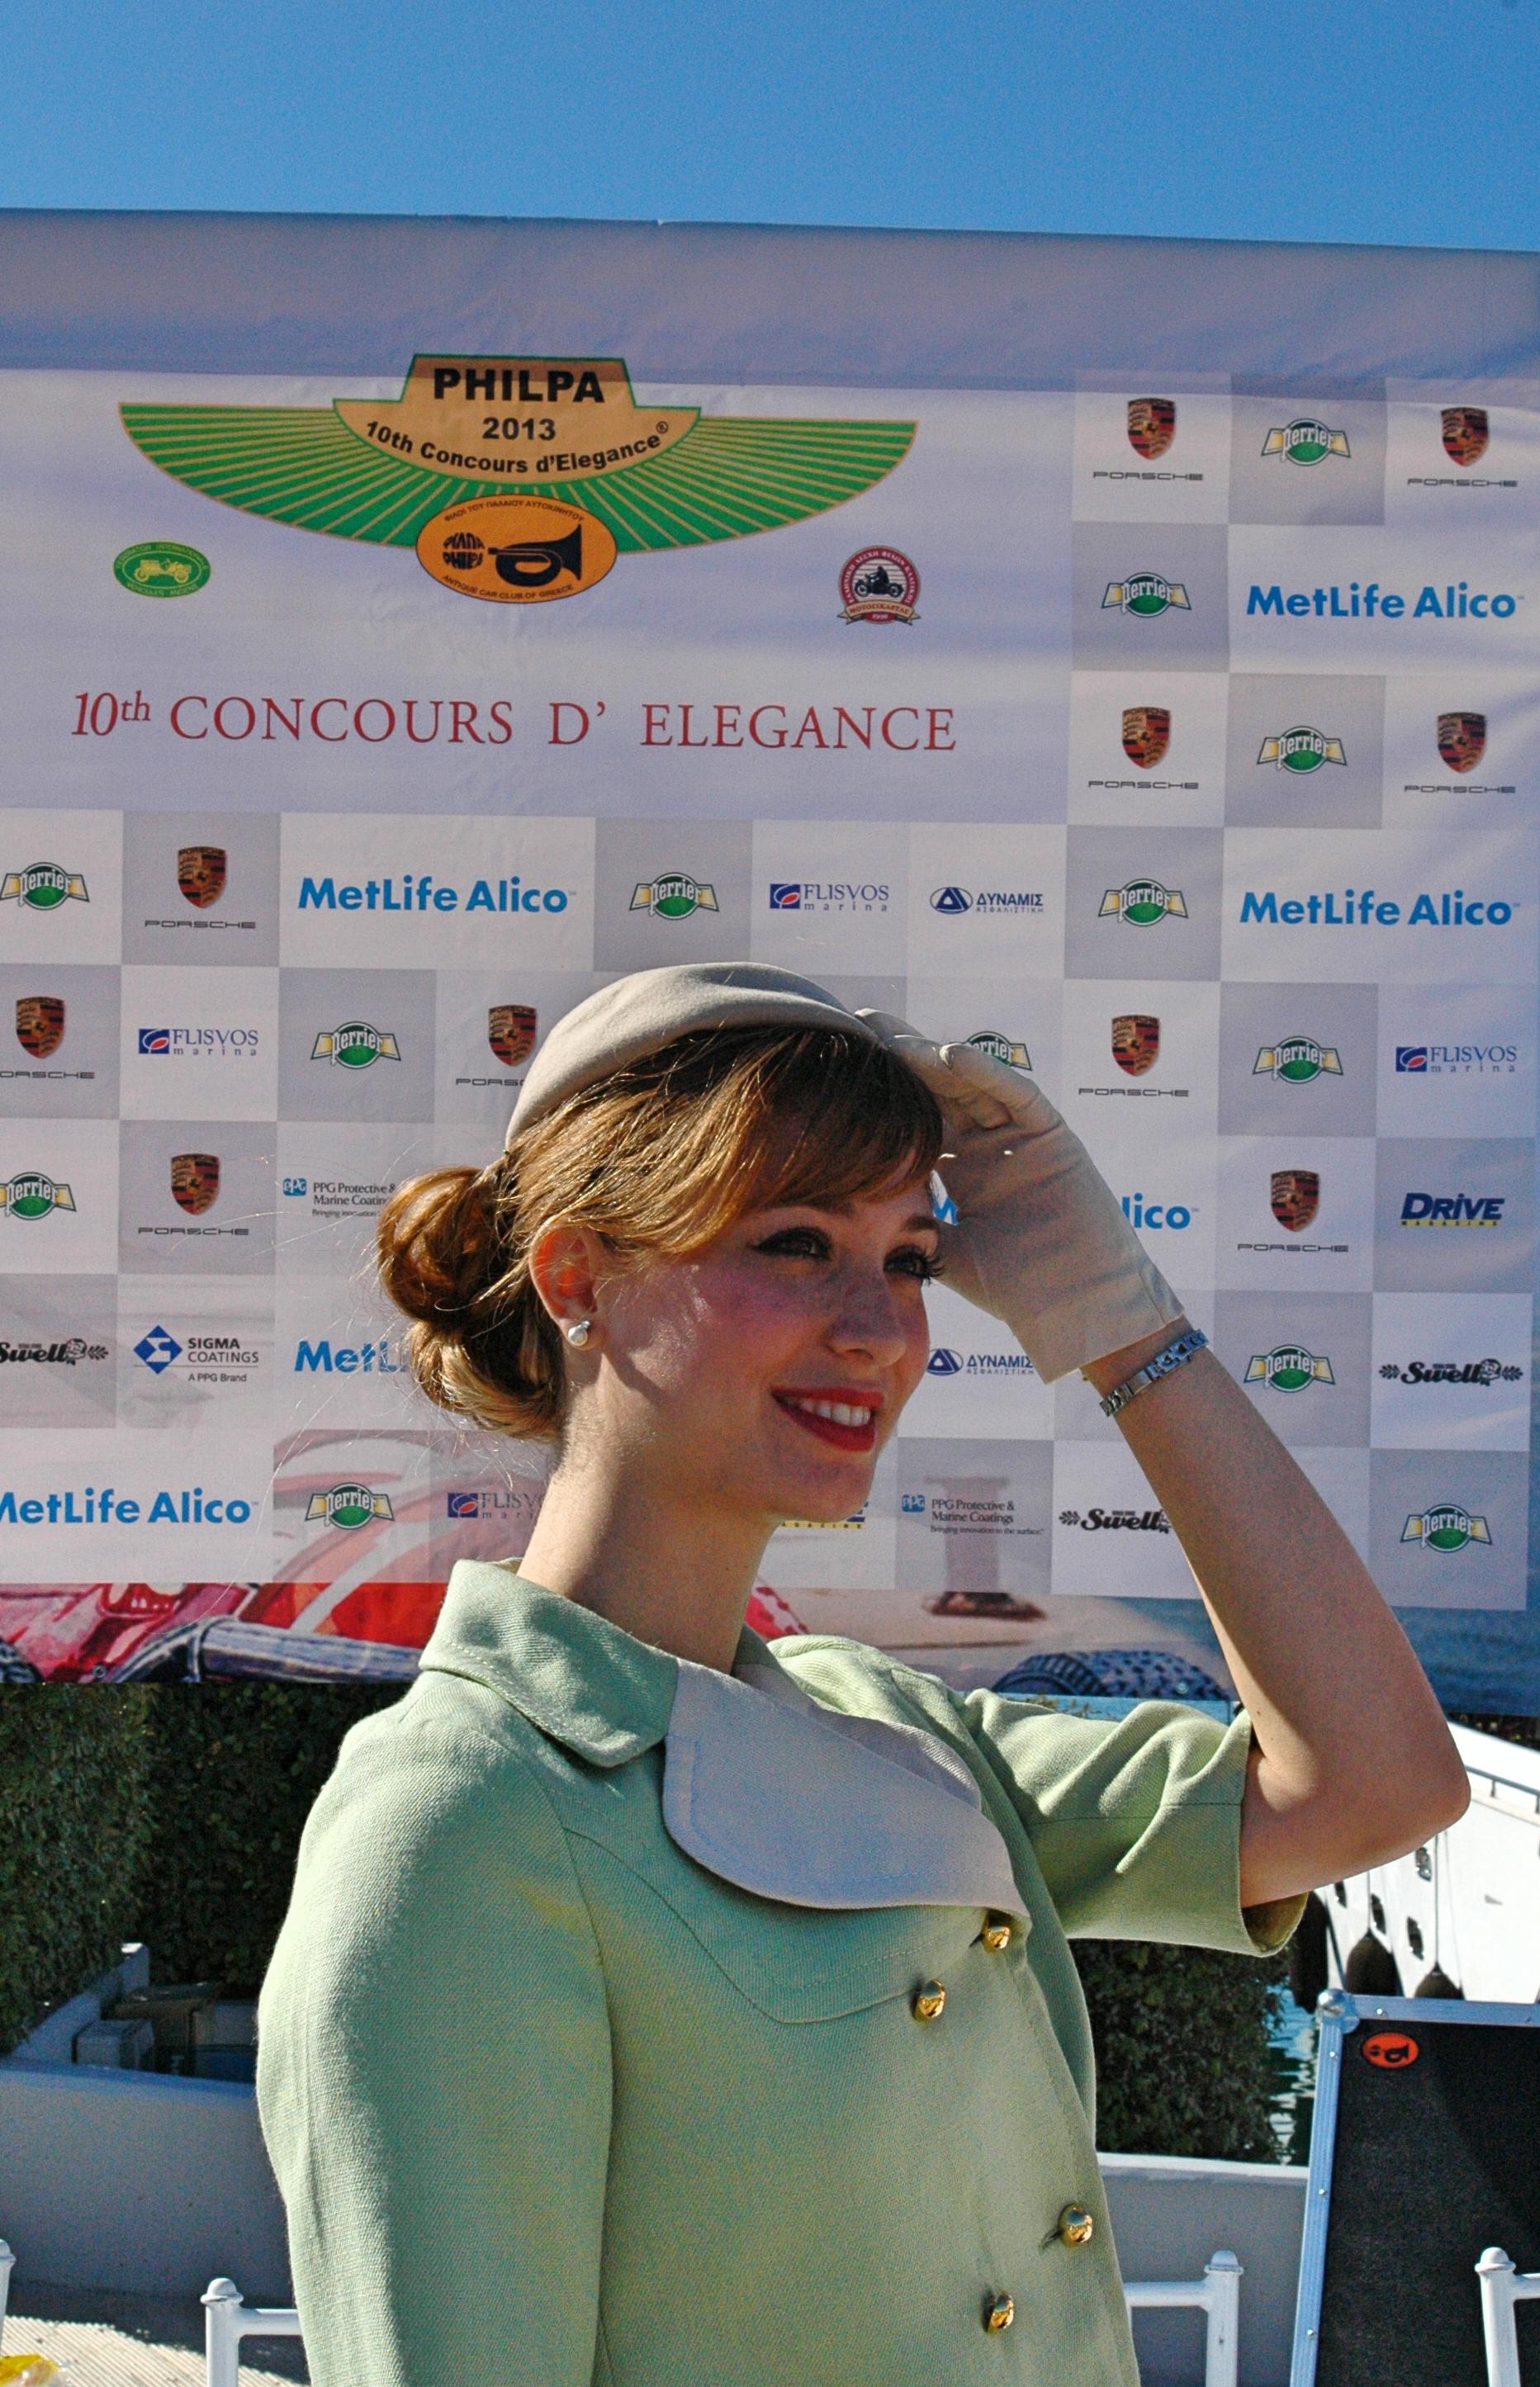 10th Philpa Concours d'Elegance 2013